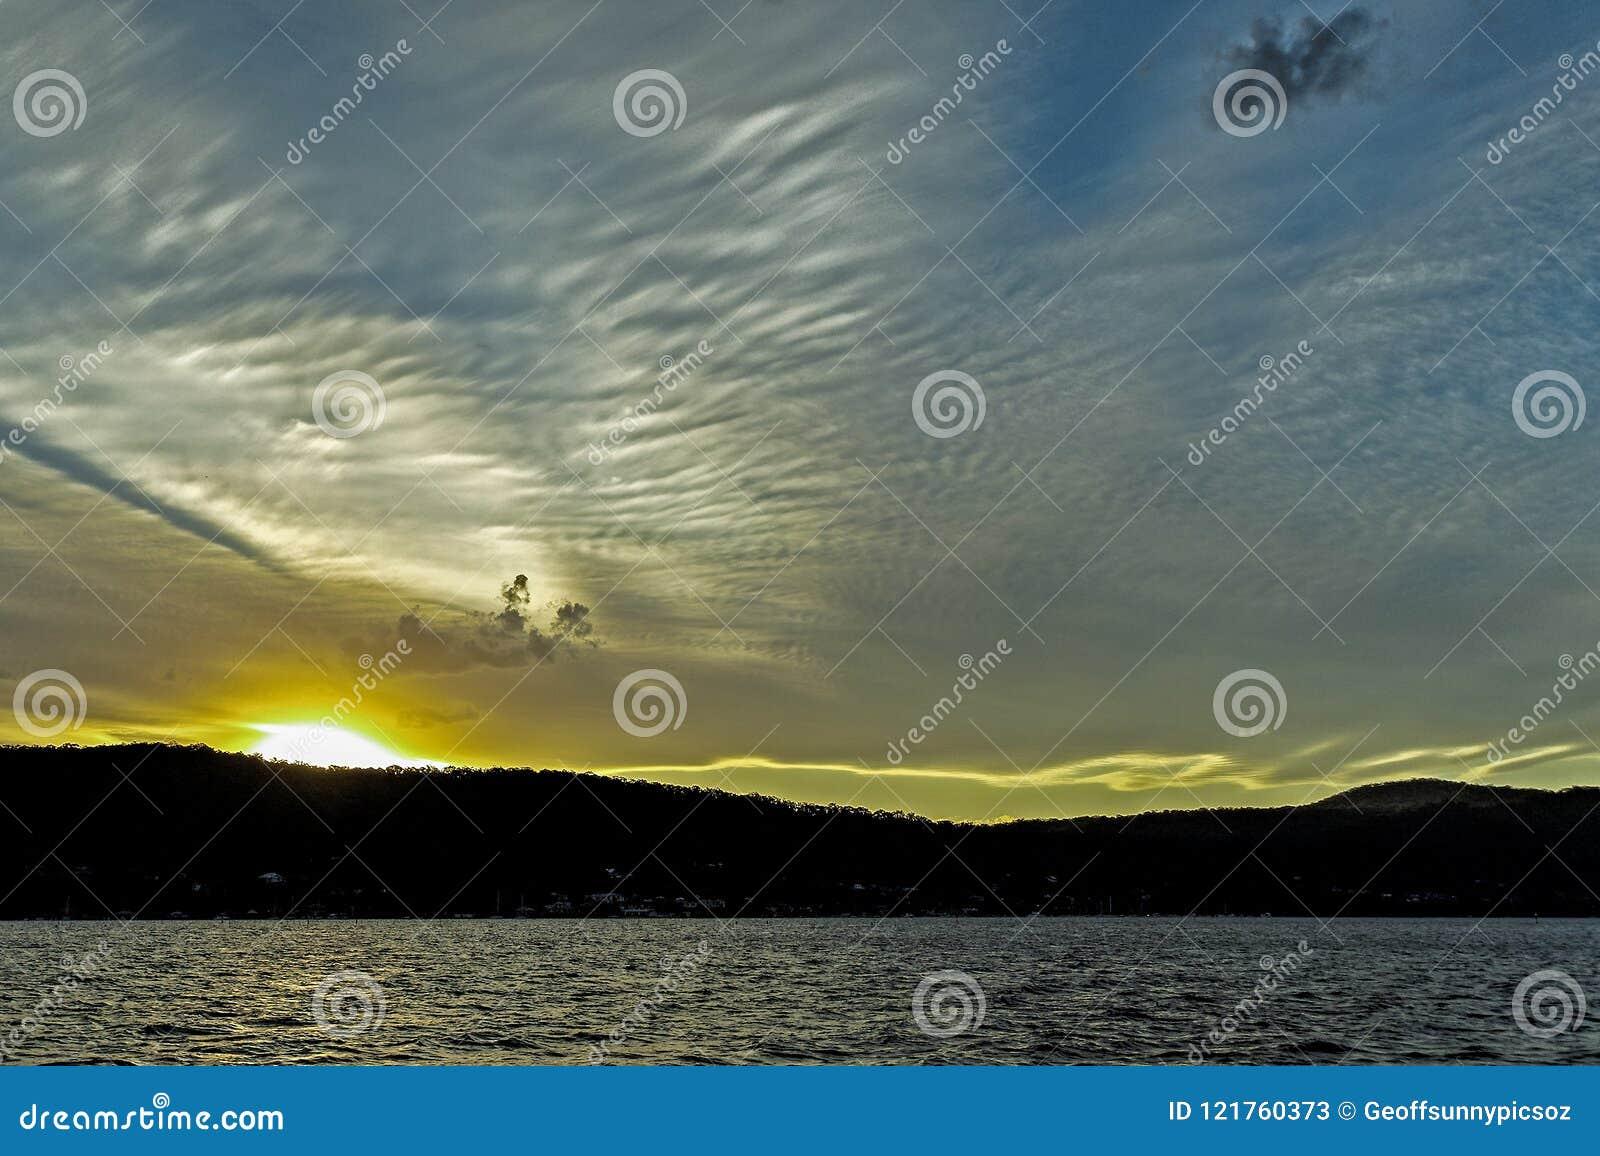 A delightful Cirrus cloud in pale blue sky. Australia.